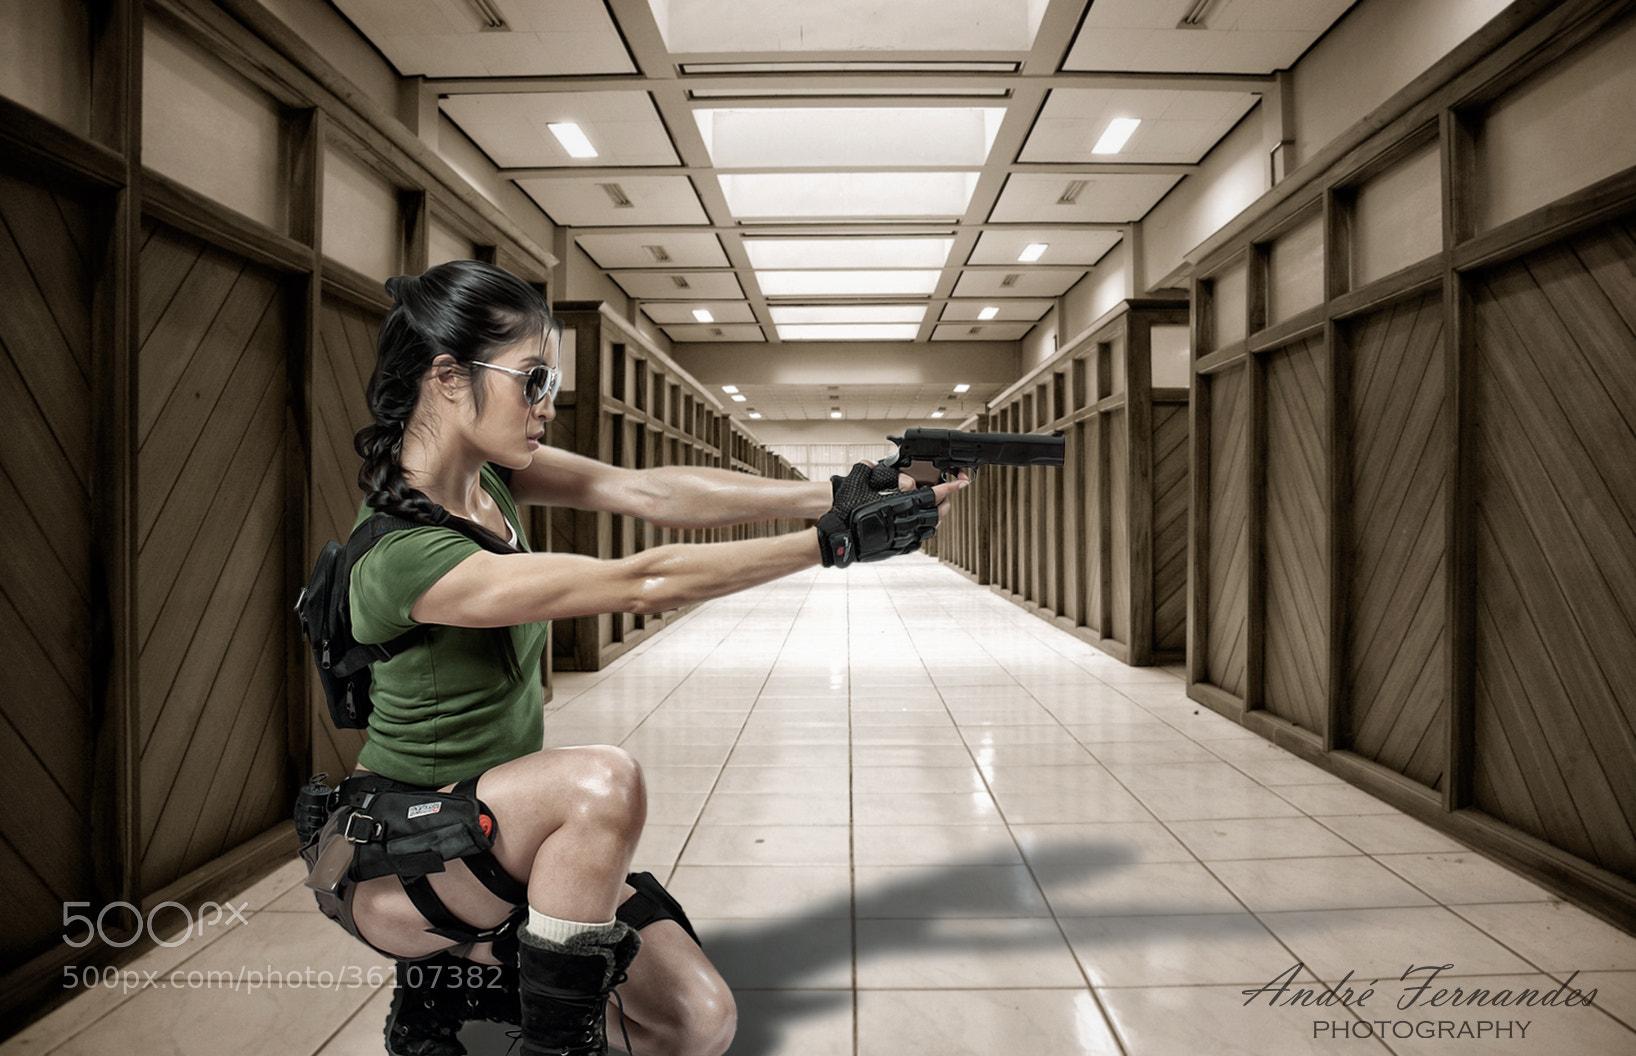 Photograph HEADSHOT - Lara Croft by André Fernandes on 500px